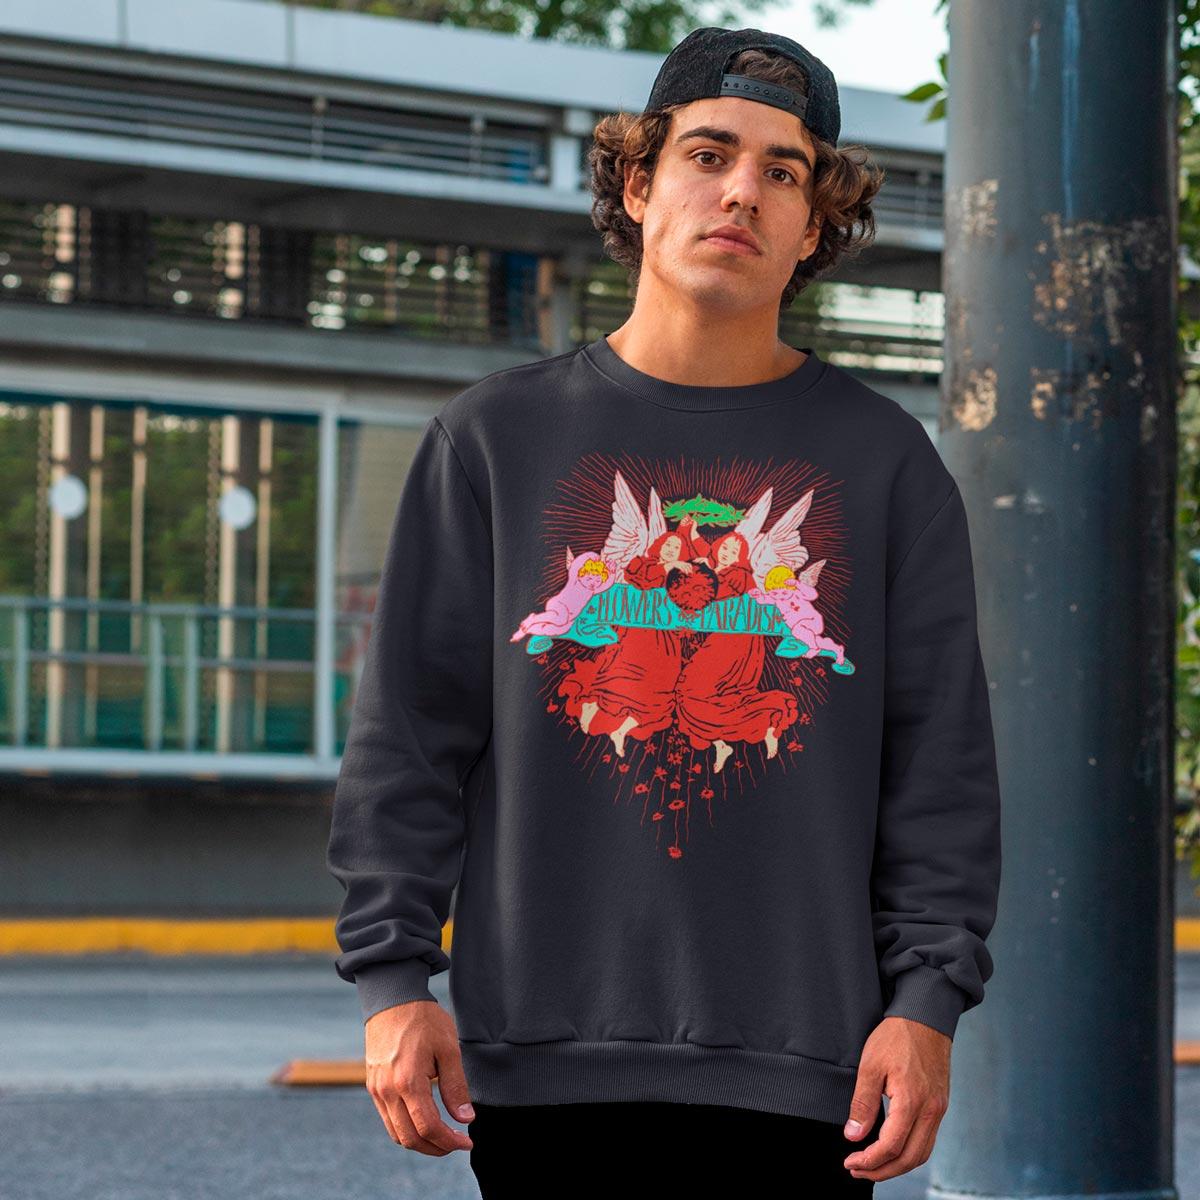 Cool Angels sweatshirts mono y mona